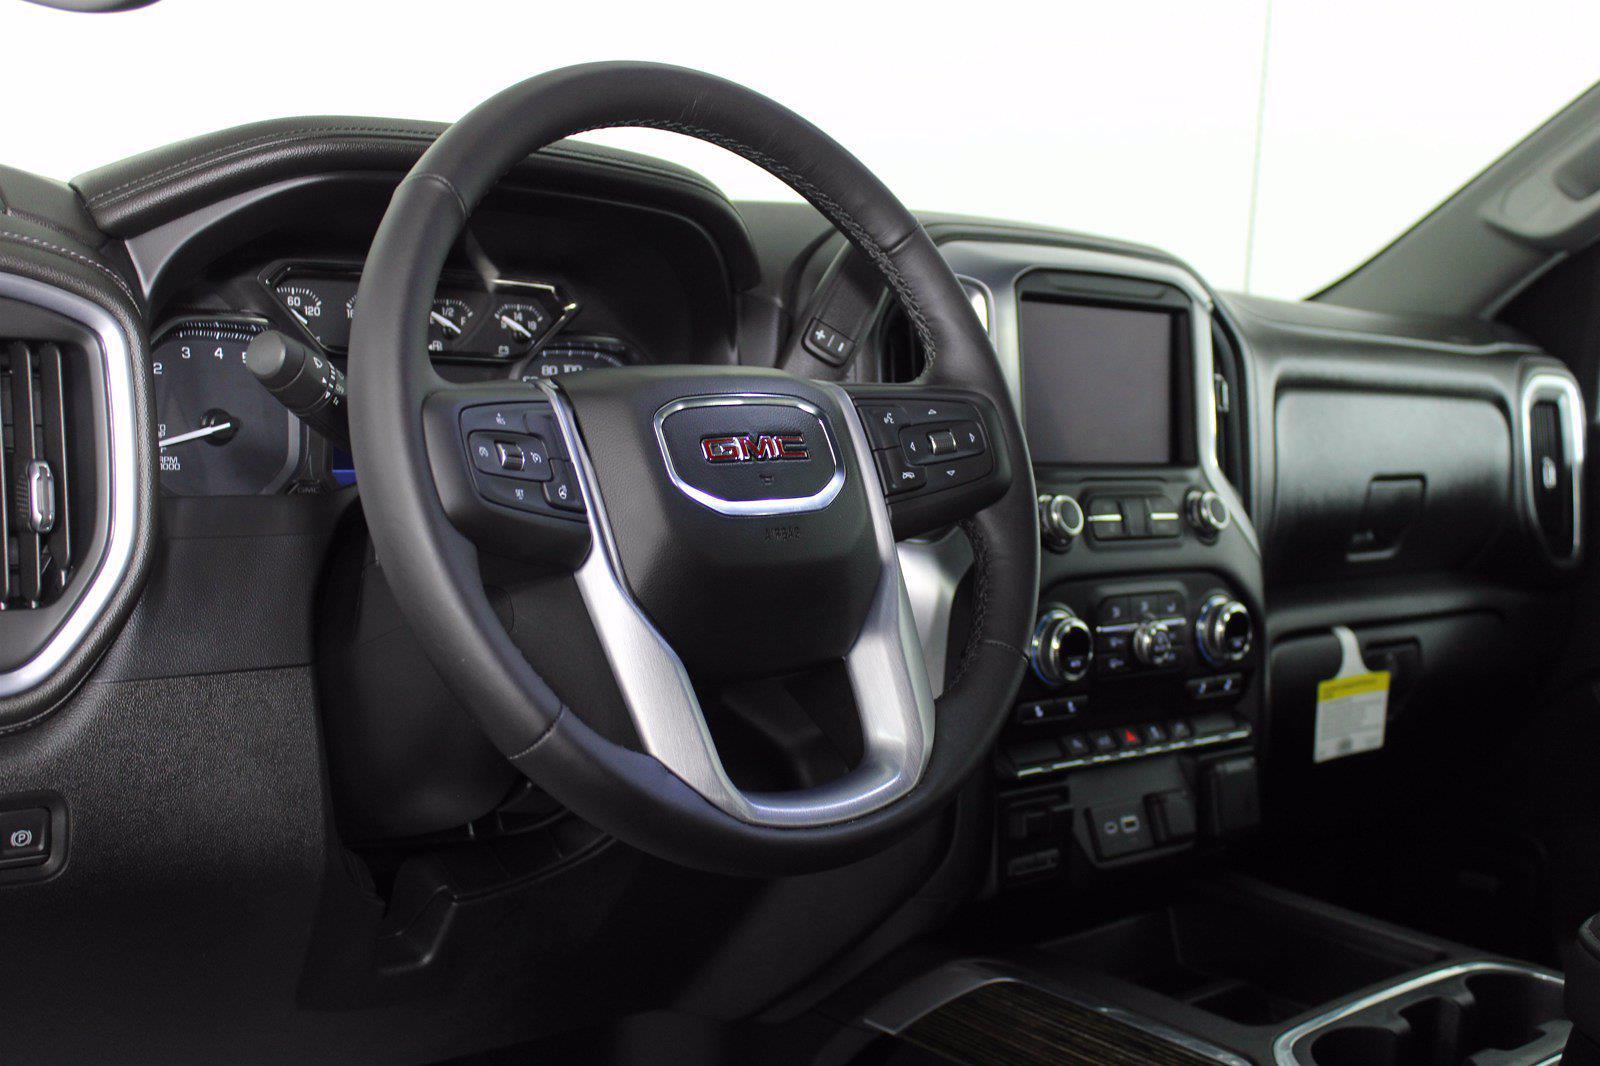 2020 GMC Sierra 1500 Crew Cab 4x4, Pickup #DAF0533 - photo 2